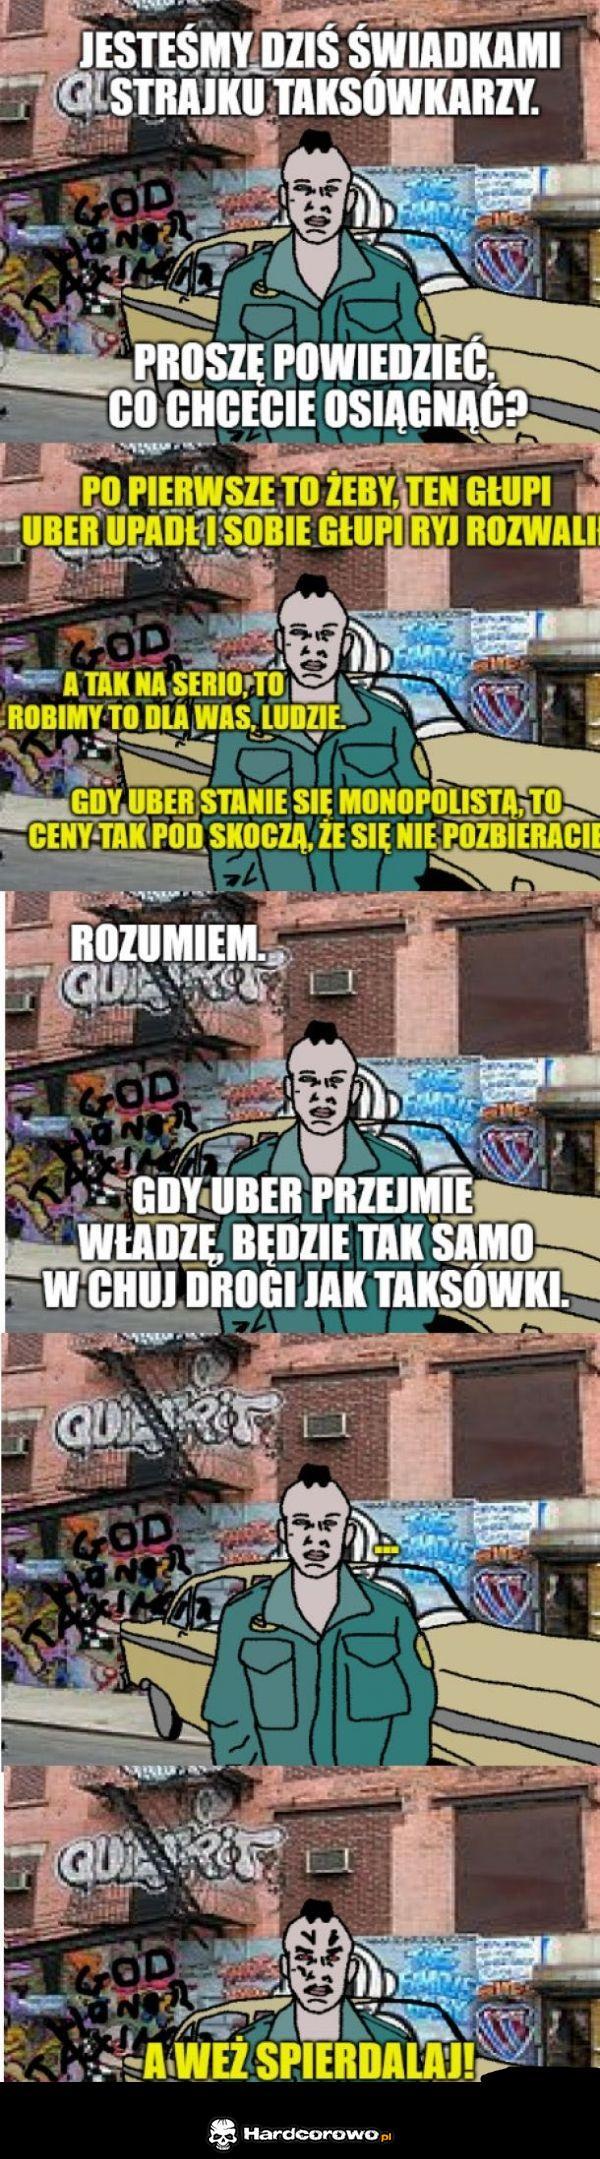 Strajk taksówkarzy - 1